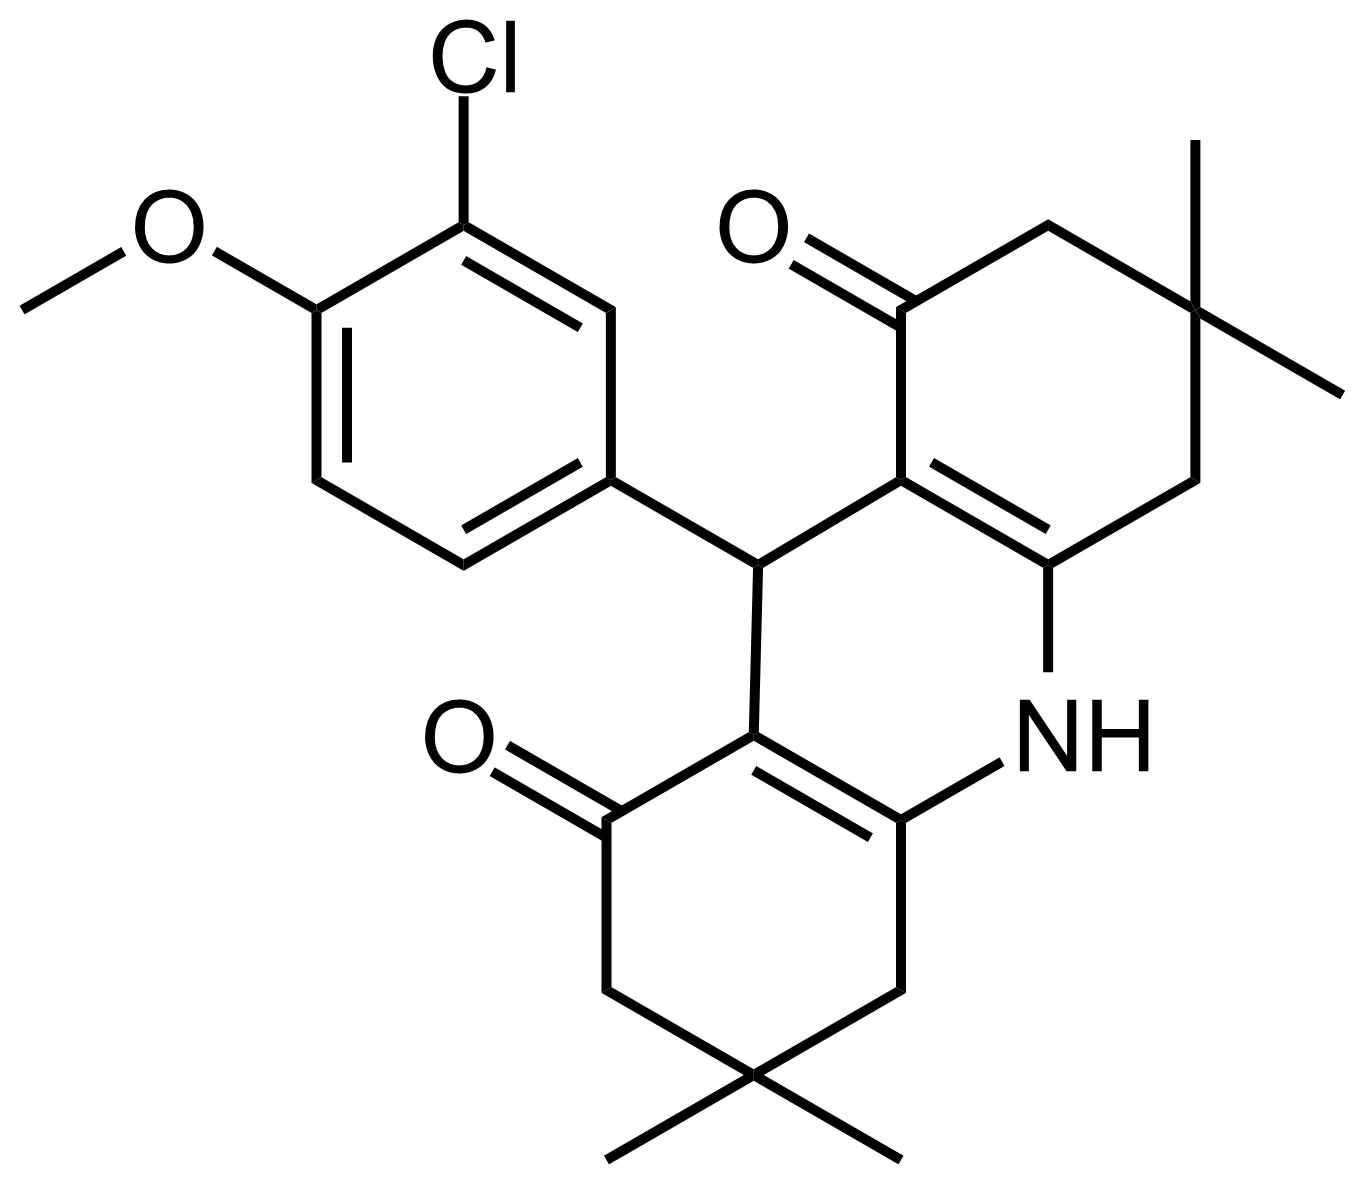 Structure of 9-(3-Chloro-4-methoxyphenyl)-3,3,6,6-tetramethyl-3,4,6,7,9,10-hexahydroacridine-1,8(2H,5H)-dione